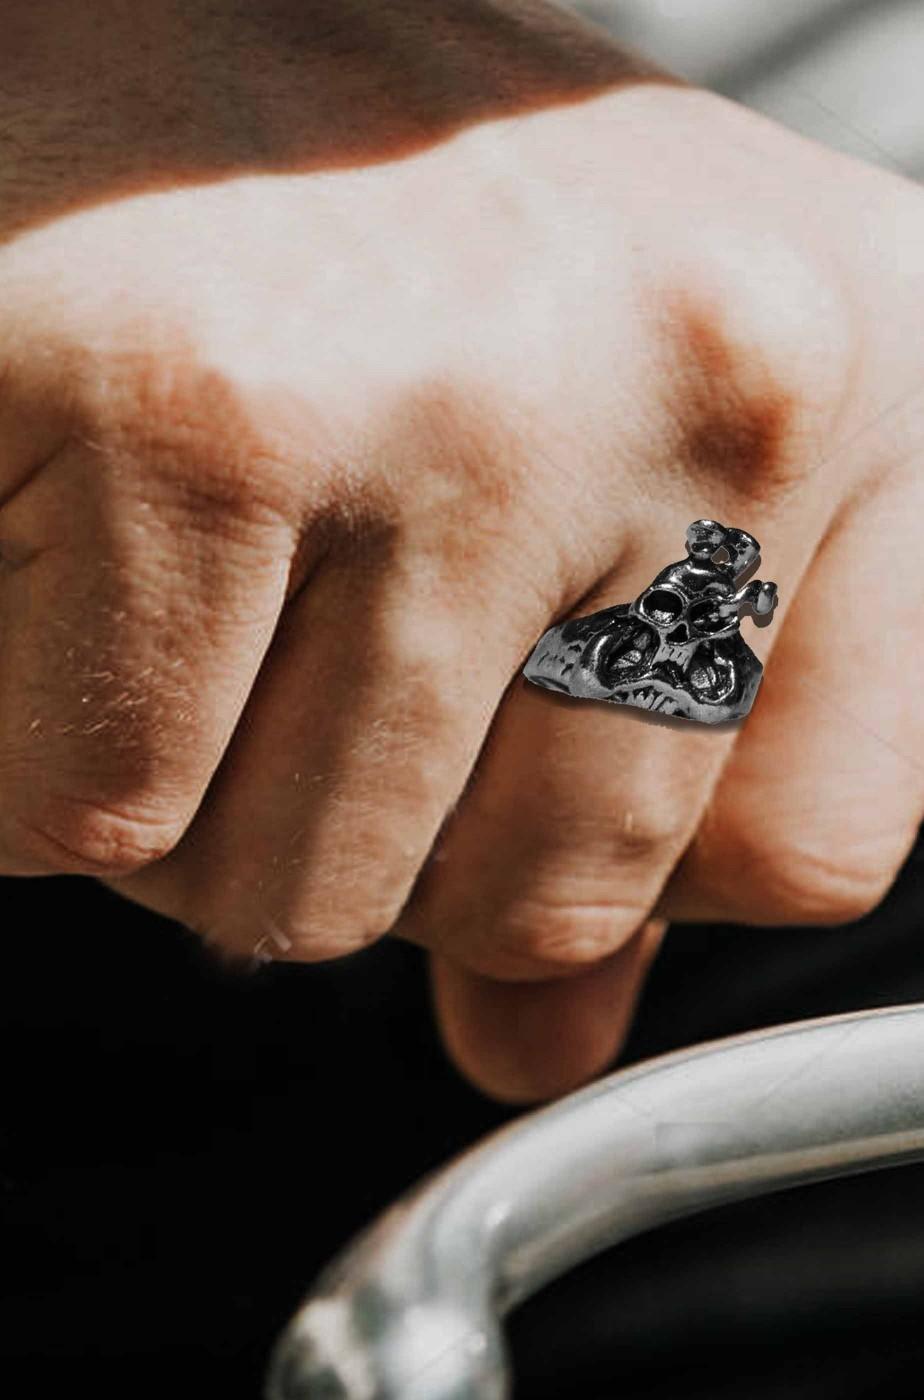 Anello biker con teschio e serpente cobra di metallo regolabile